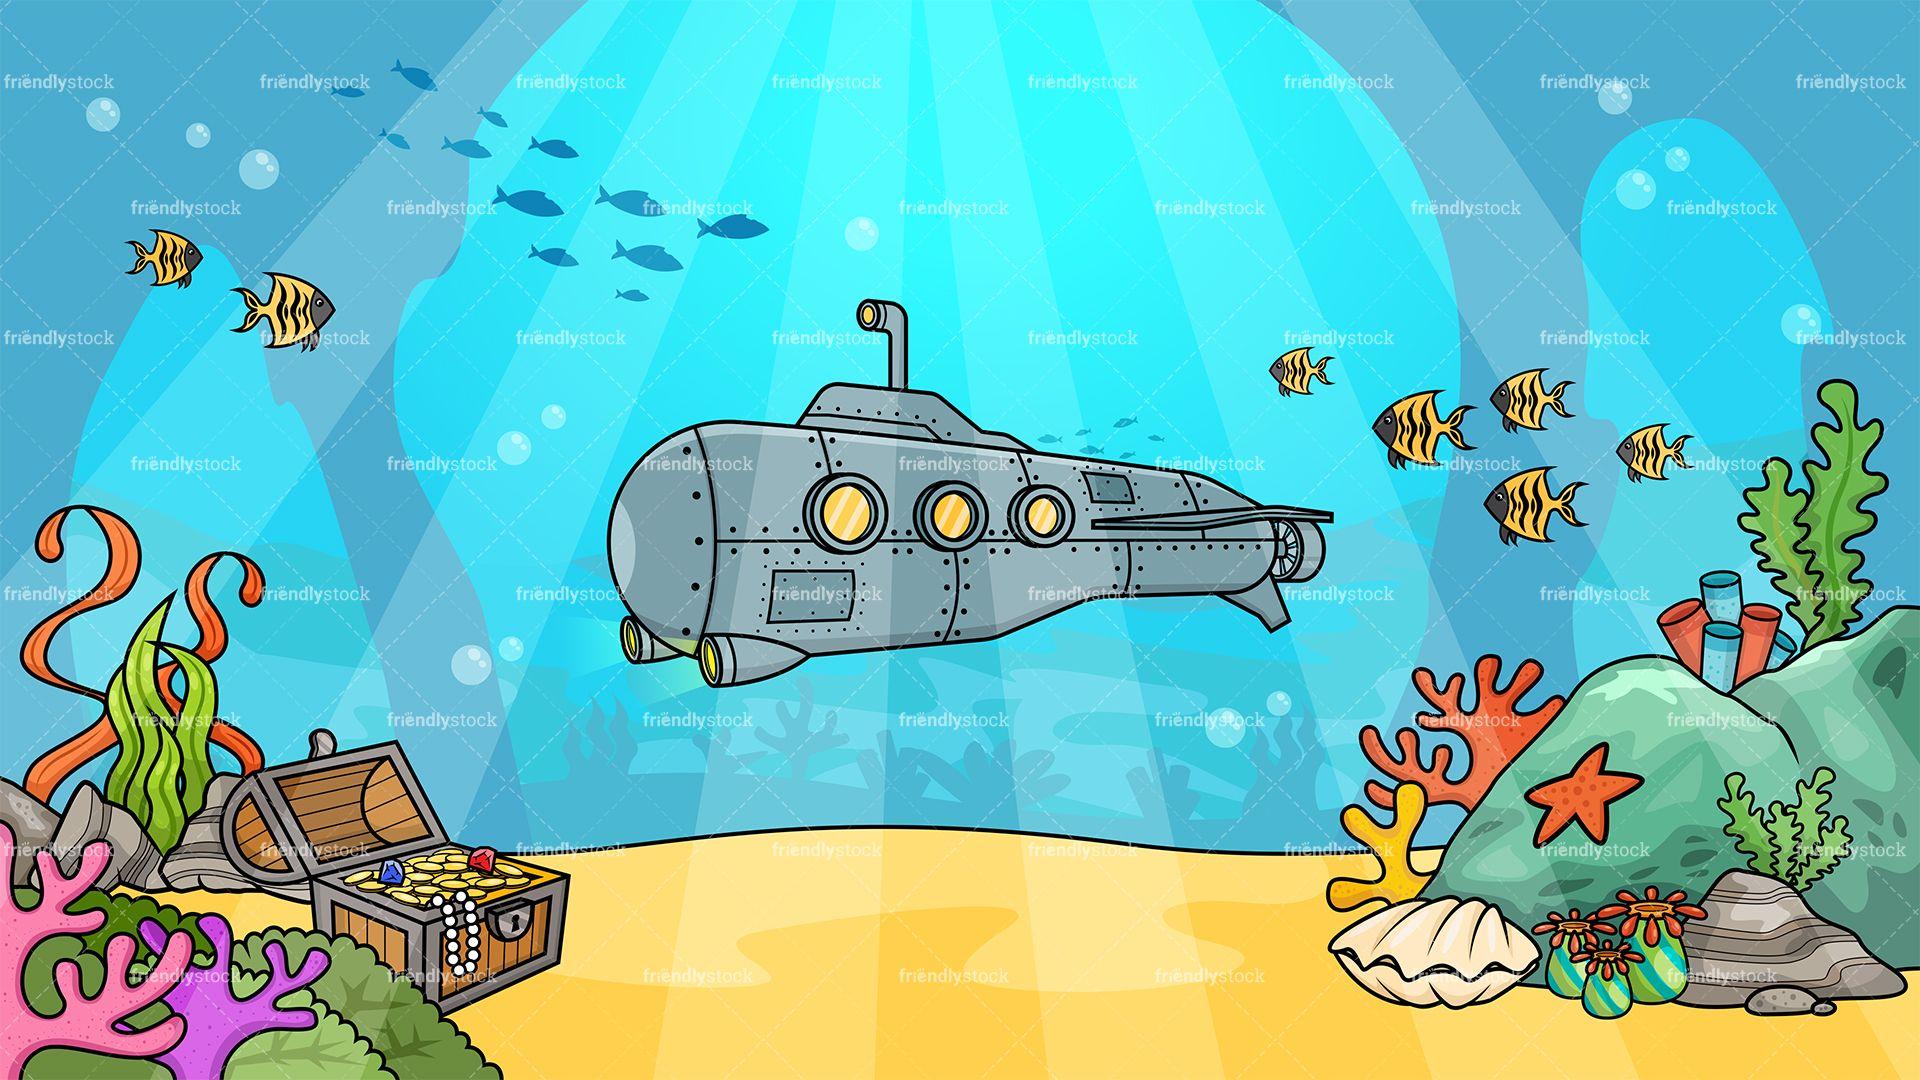 clipart transparent Underwater background ilustrations in. Submarine vector illustration